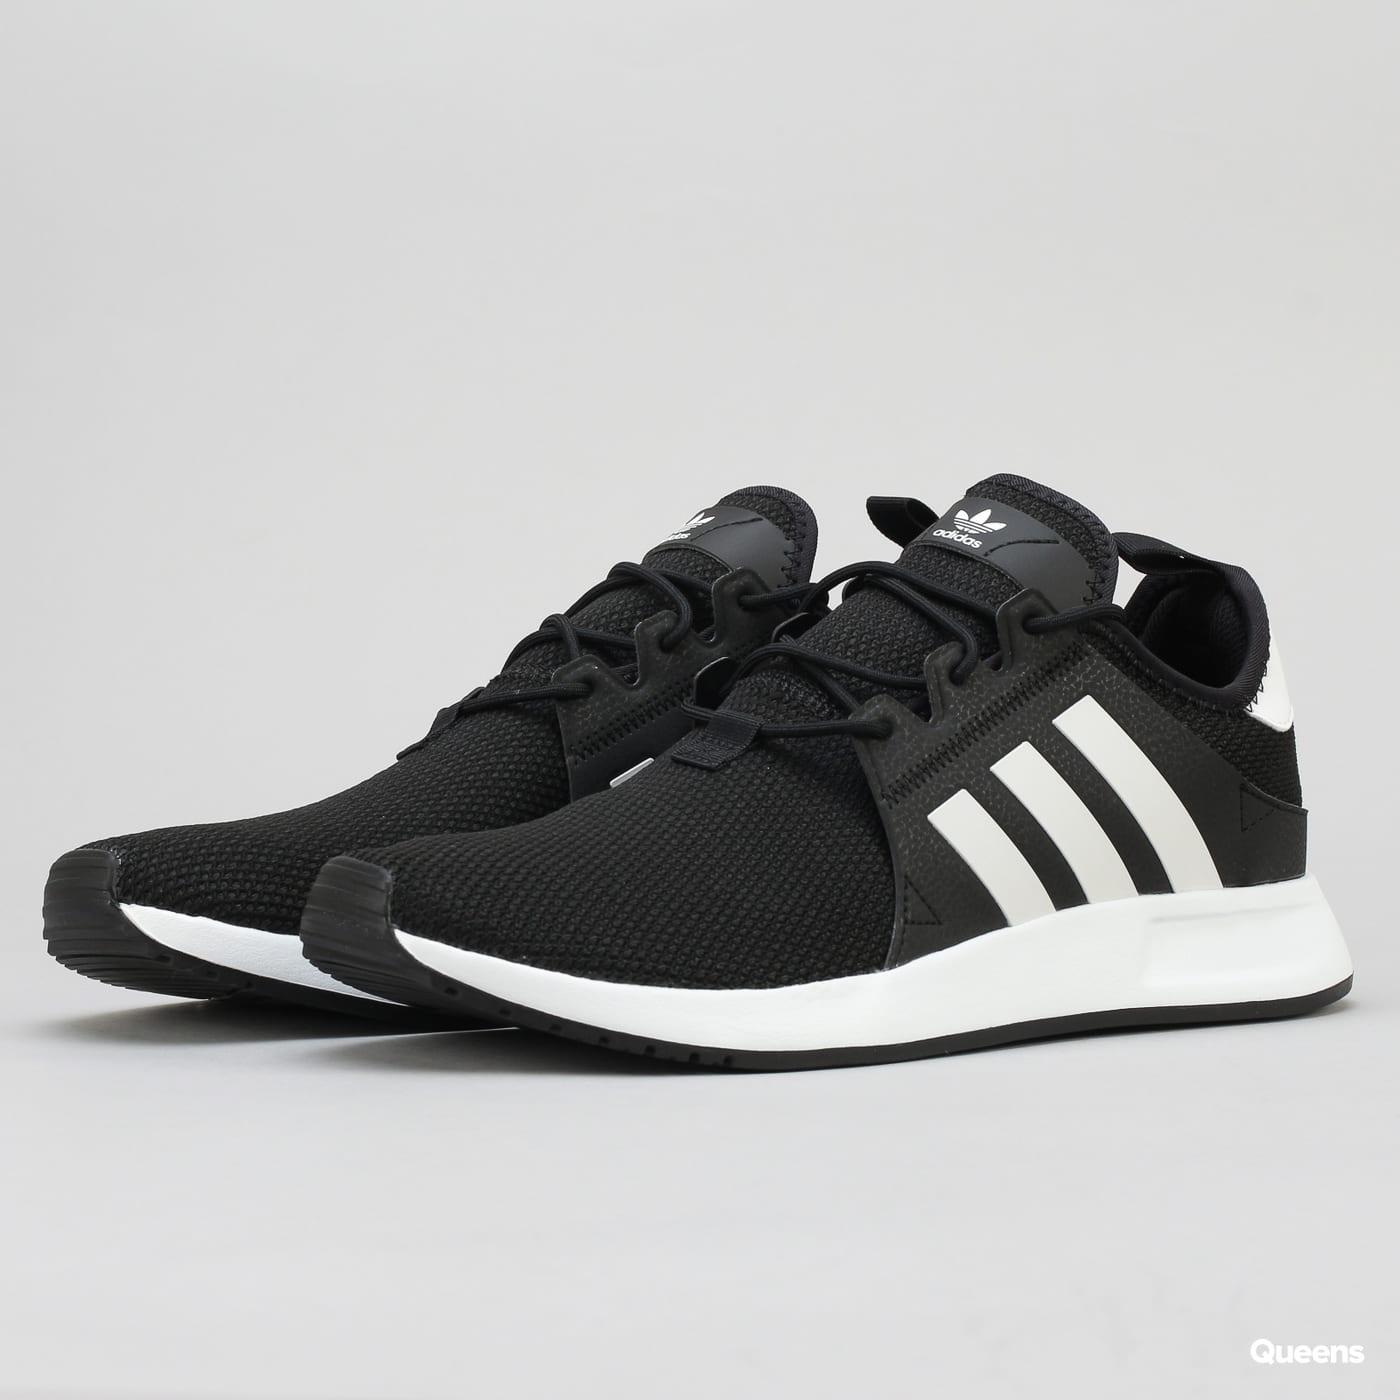 adidas Originals X_PLR cblack cblack ftwwht